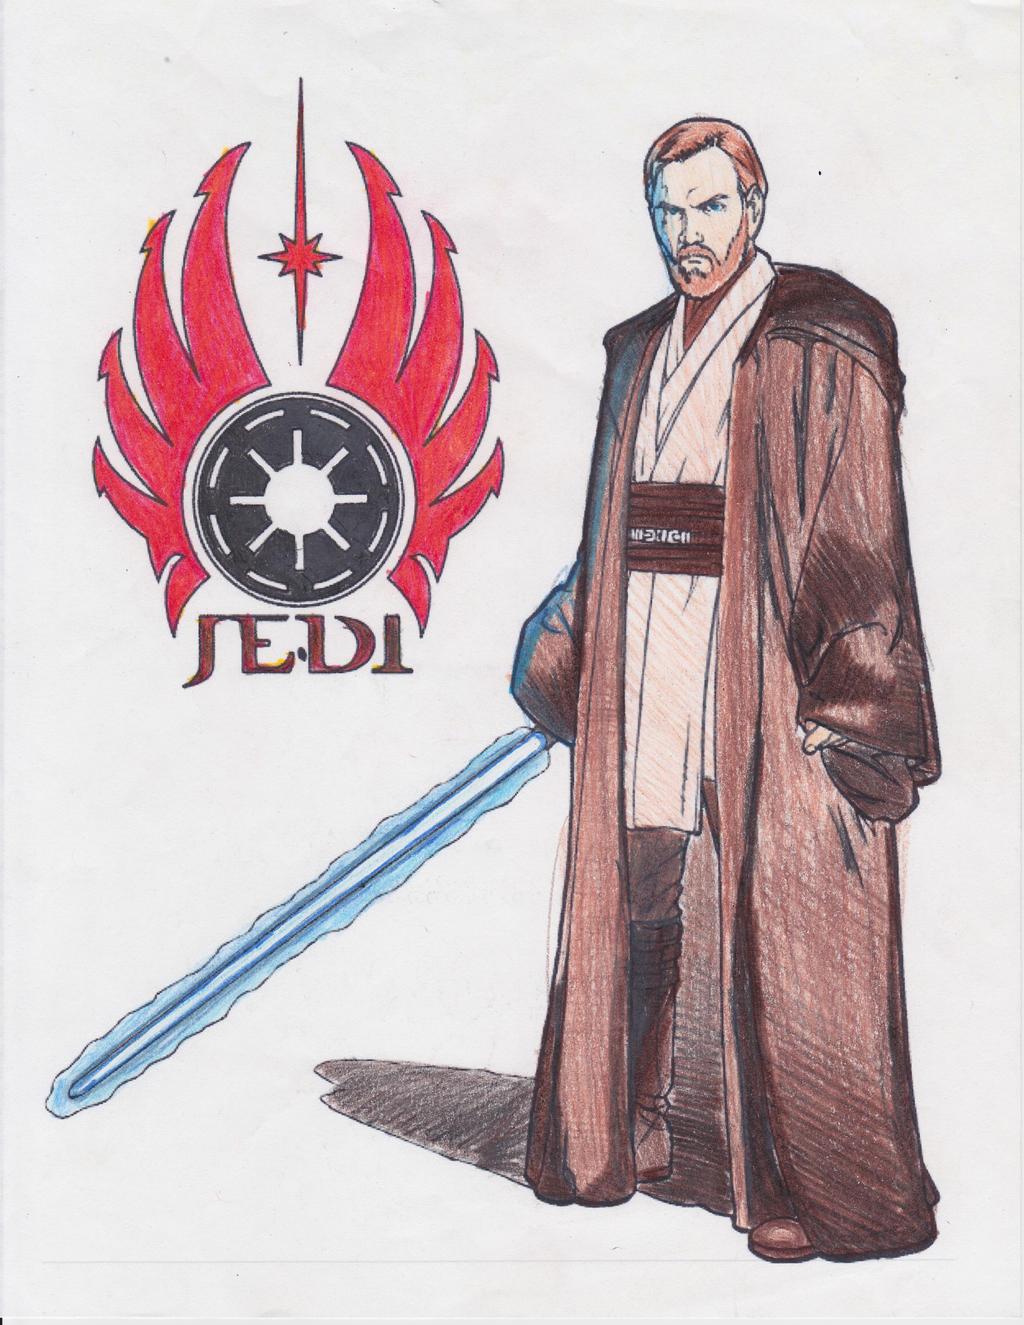 Obi-Wan Kenobi by Masterful-Mind2274 on DeviantArt